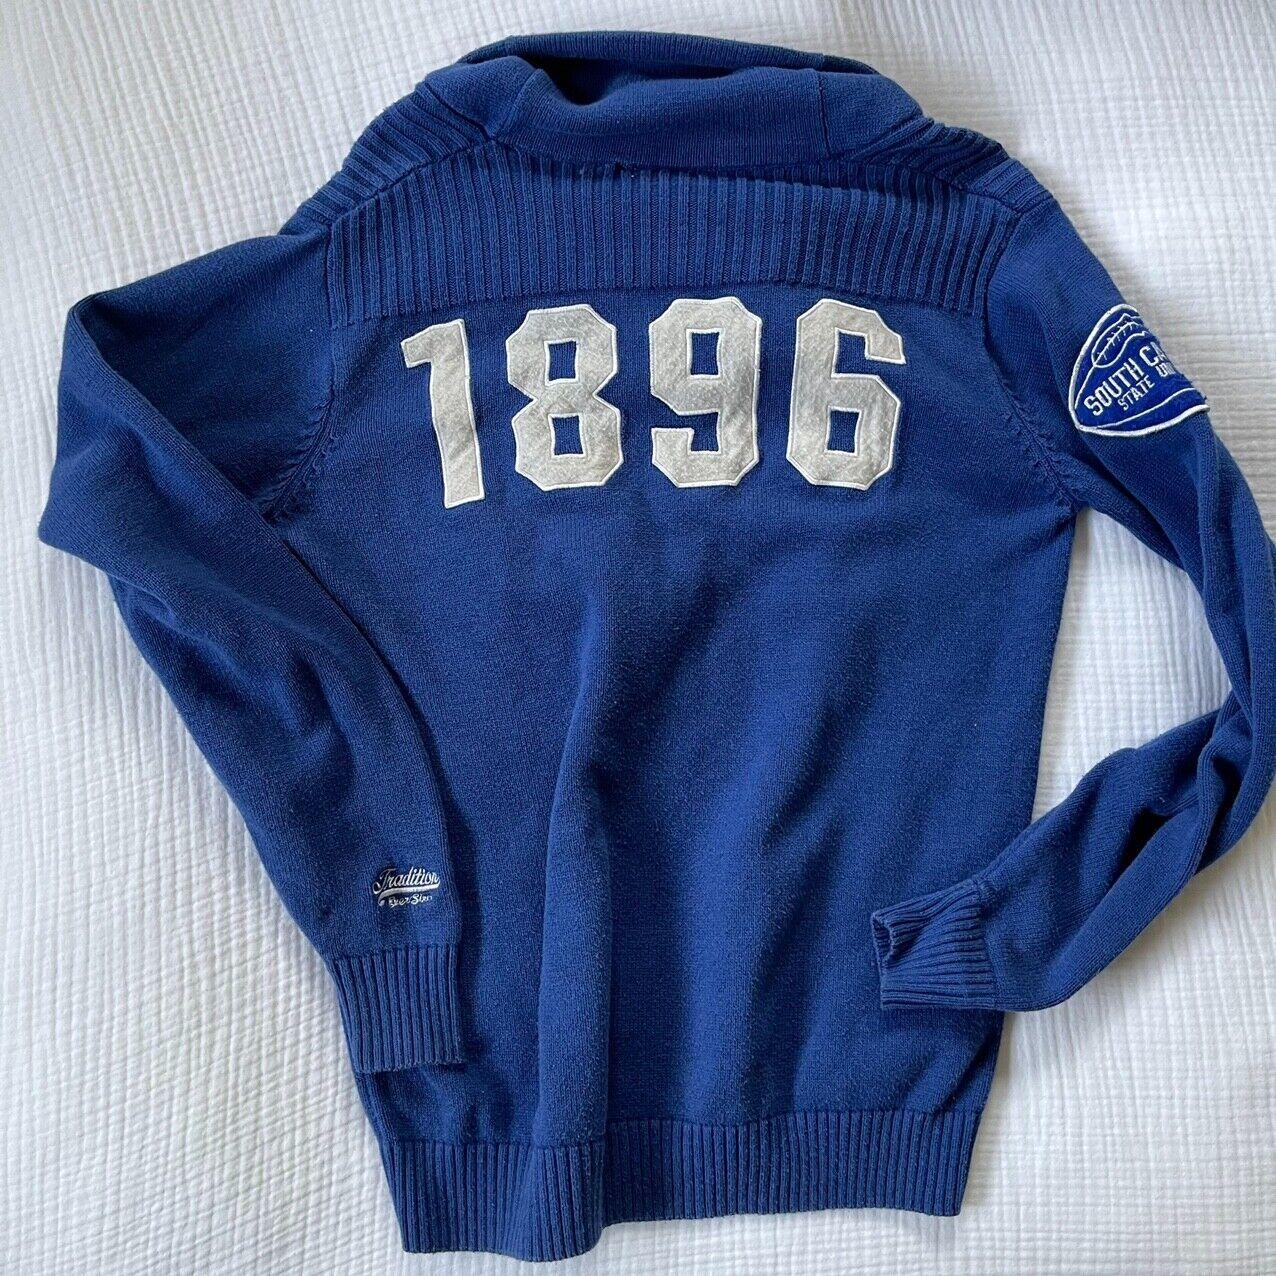 1896 Vintage Bulldogs Varsity Sweater  - image 4